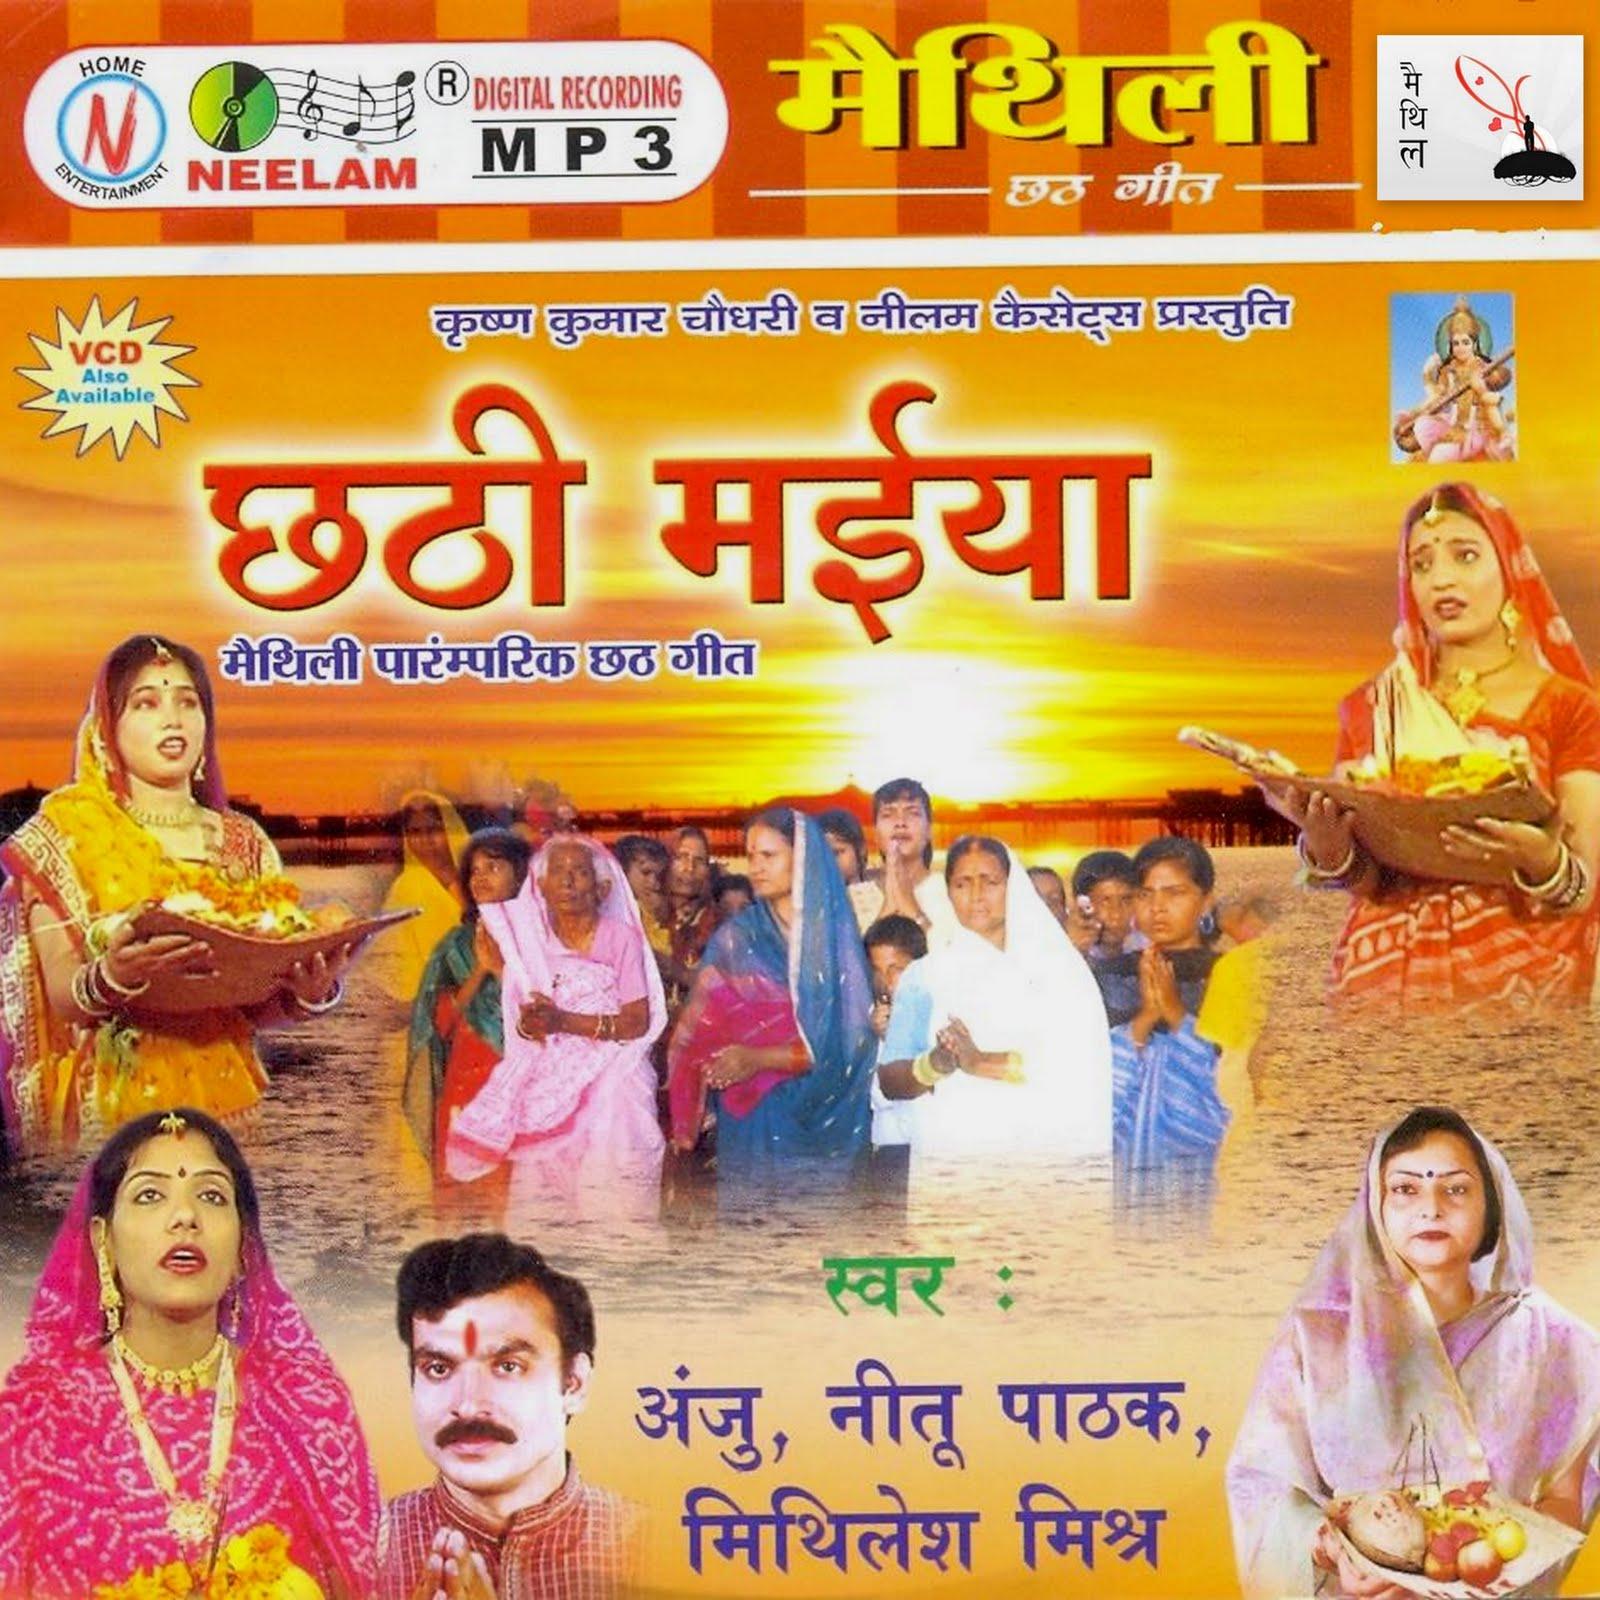 Bengali Song Download Maiya Re Maiya Re Maiya Re Mp3 Download: Indian Songs Free: Maithili Chhath Geet Part-1 : Maithili